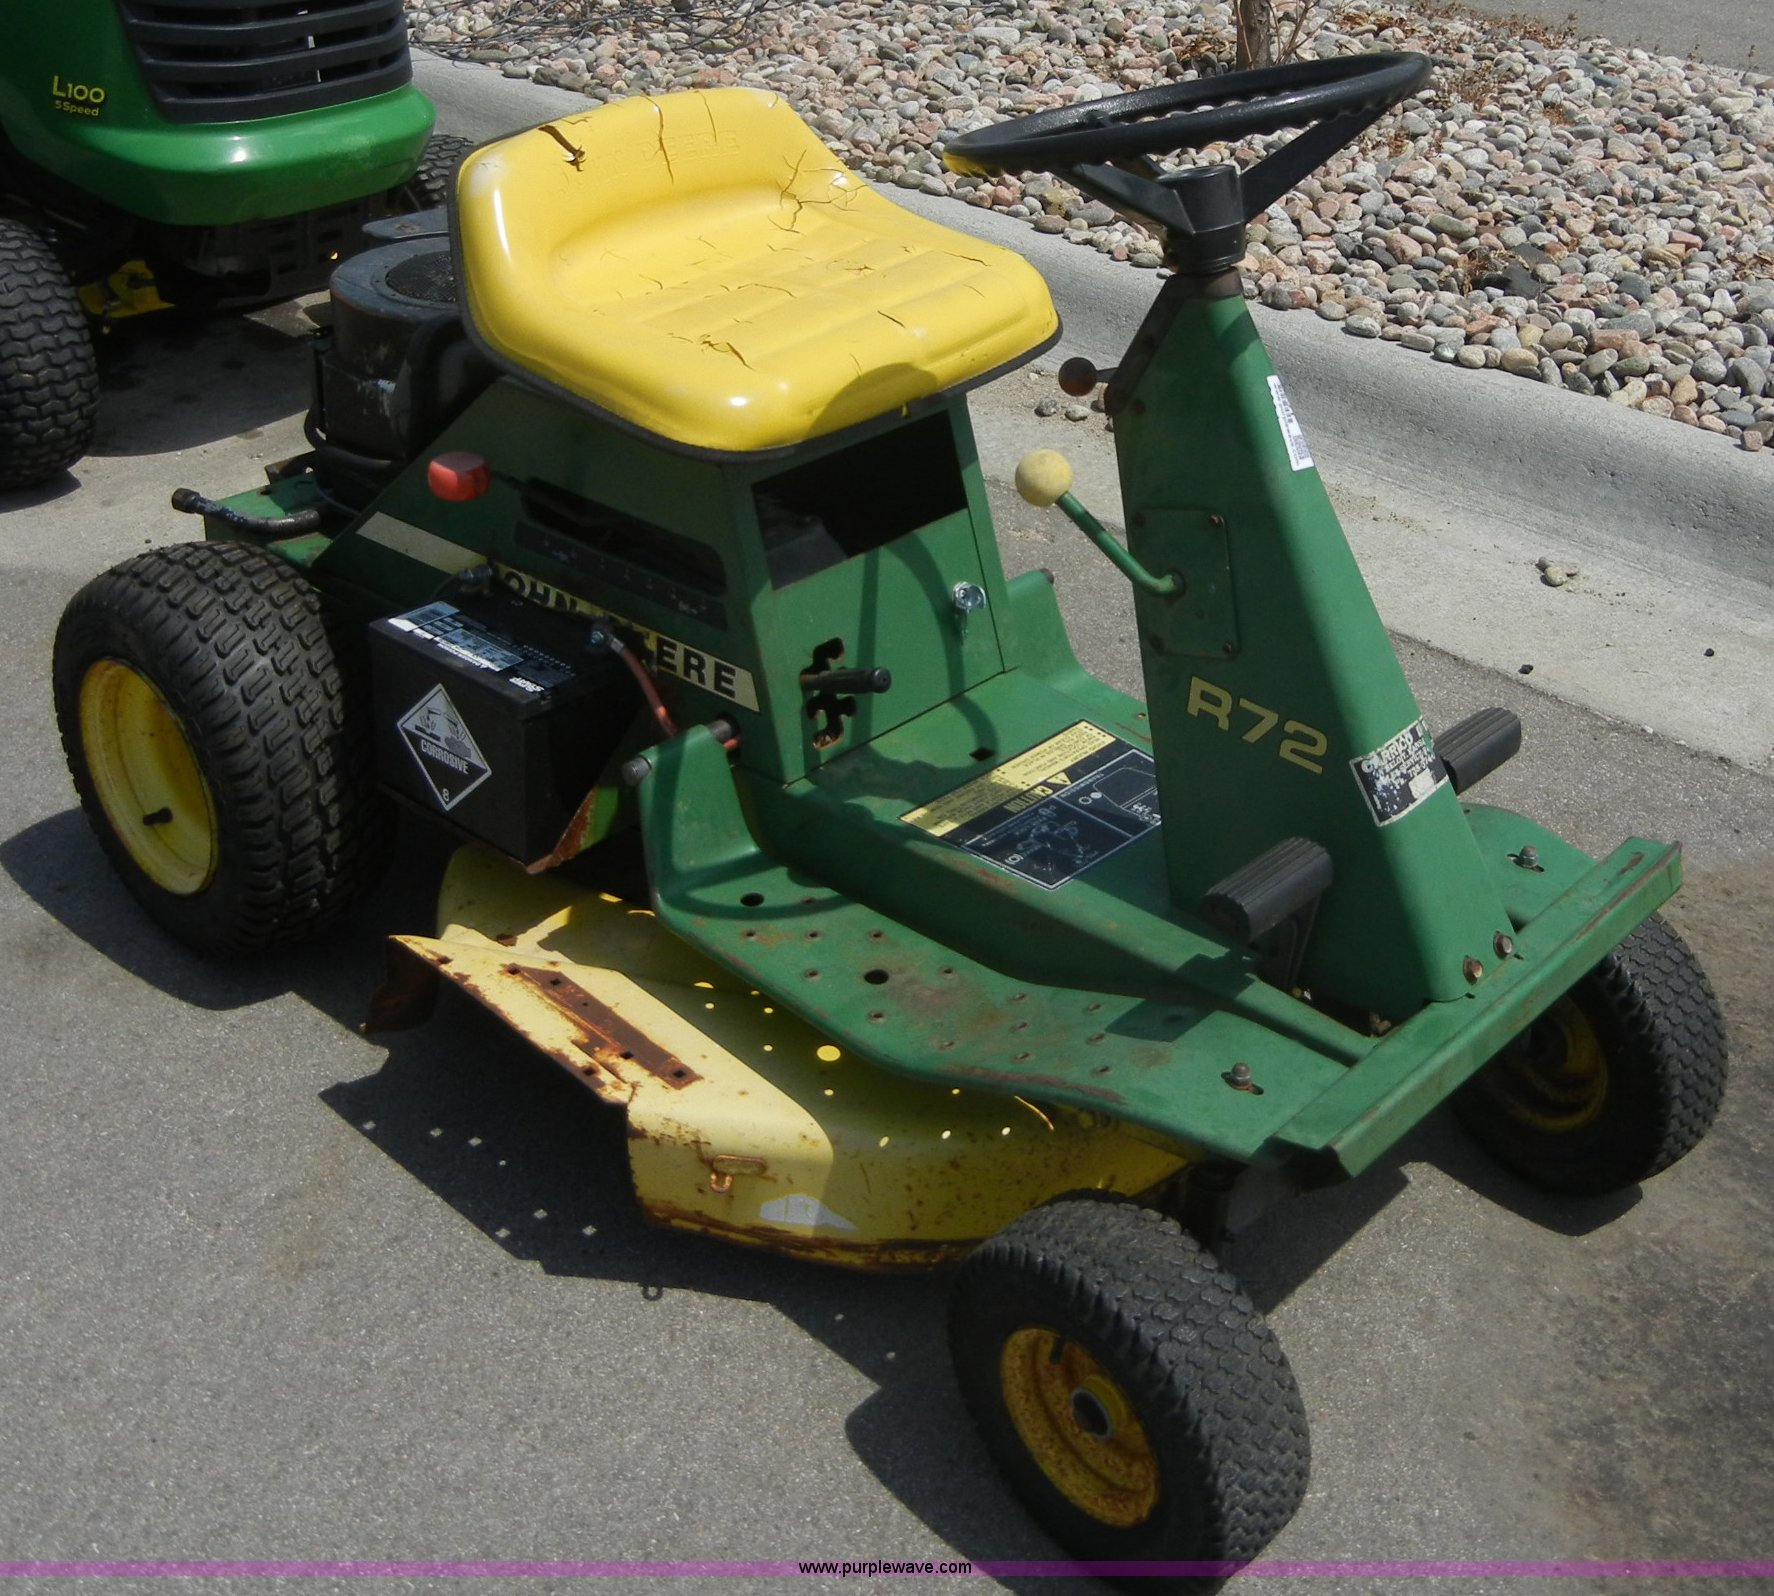 john deere r72 riding mower item 2231 sold june 1 midwe rh purplewave com John Deere R72 Parts Diagram John Deere R72 Mower Diagram